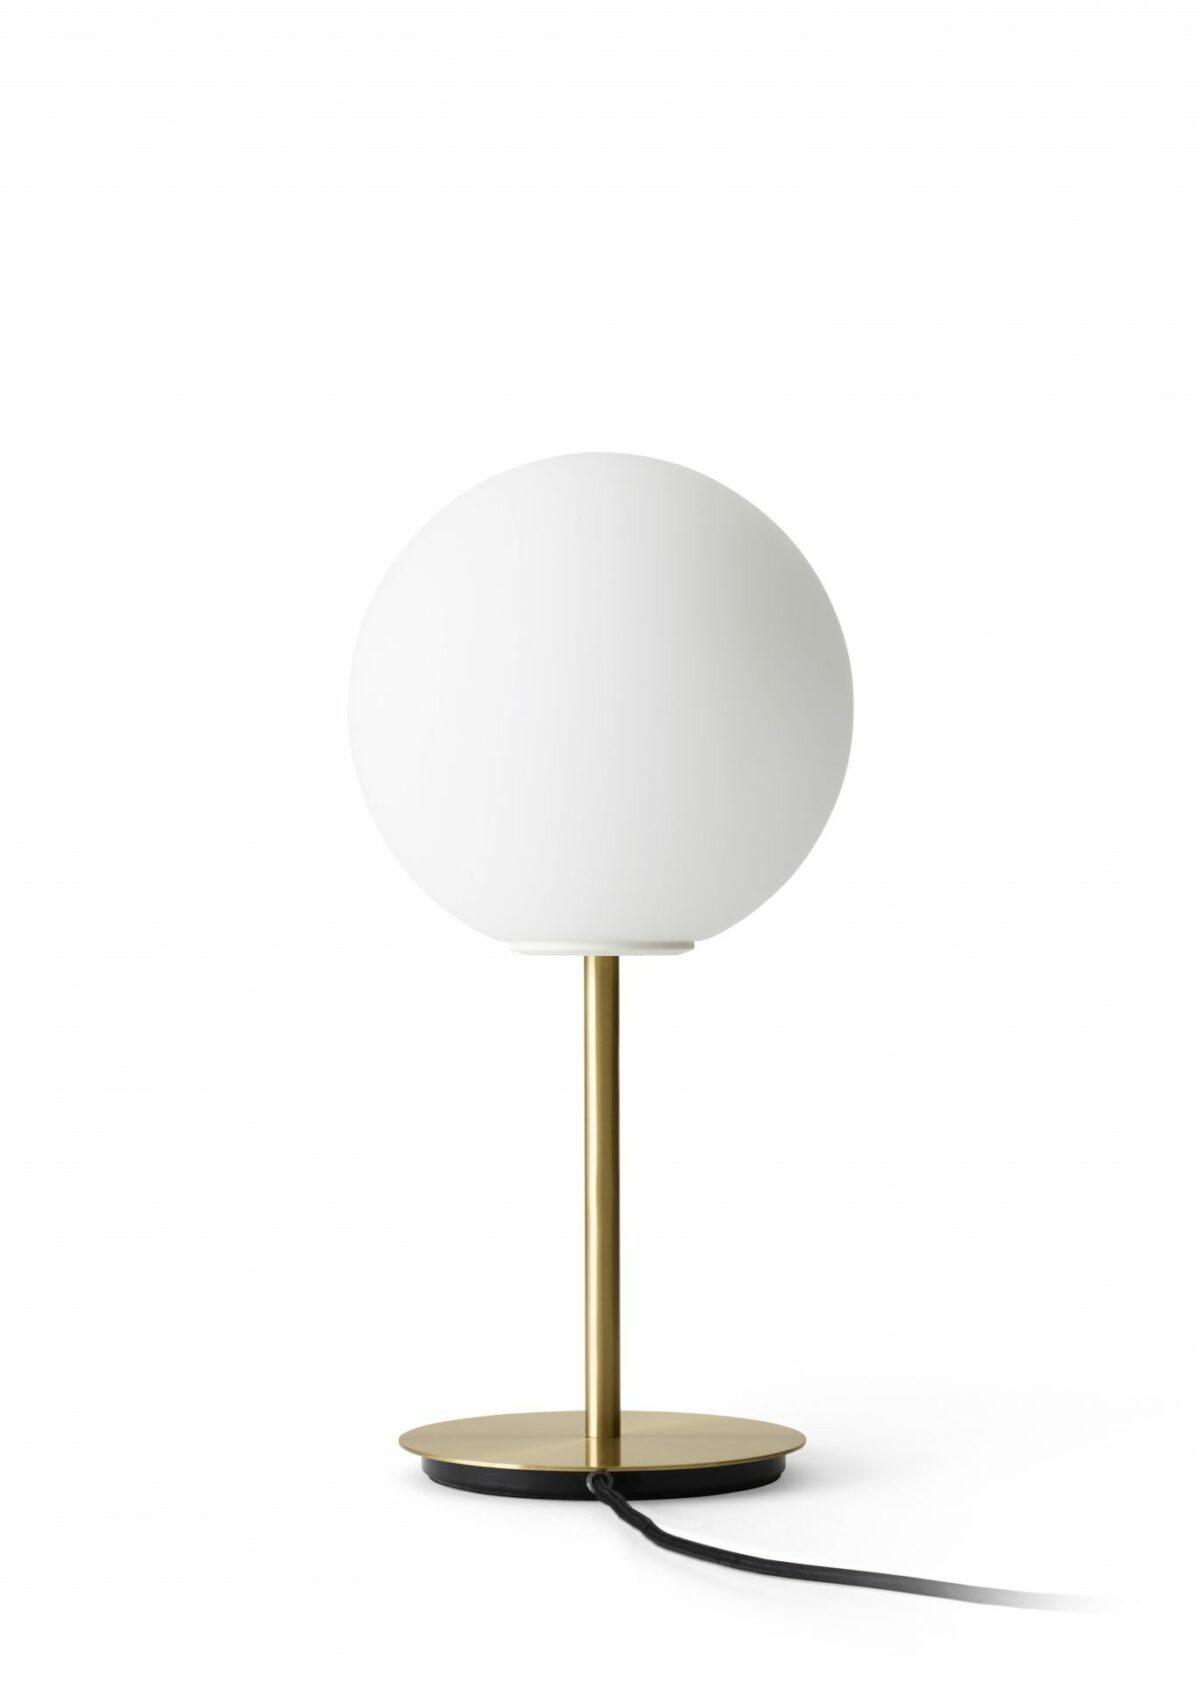 1461689 TR Bulb Table Brass back DtW 1